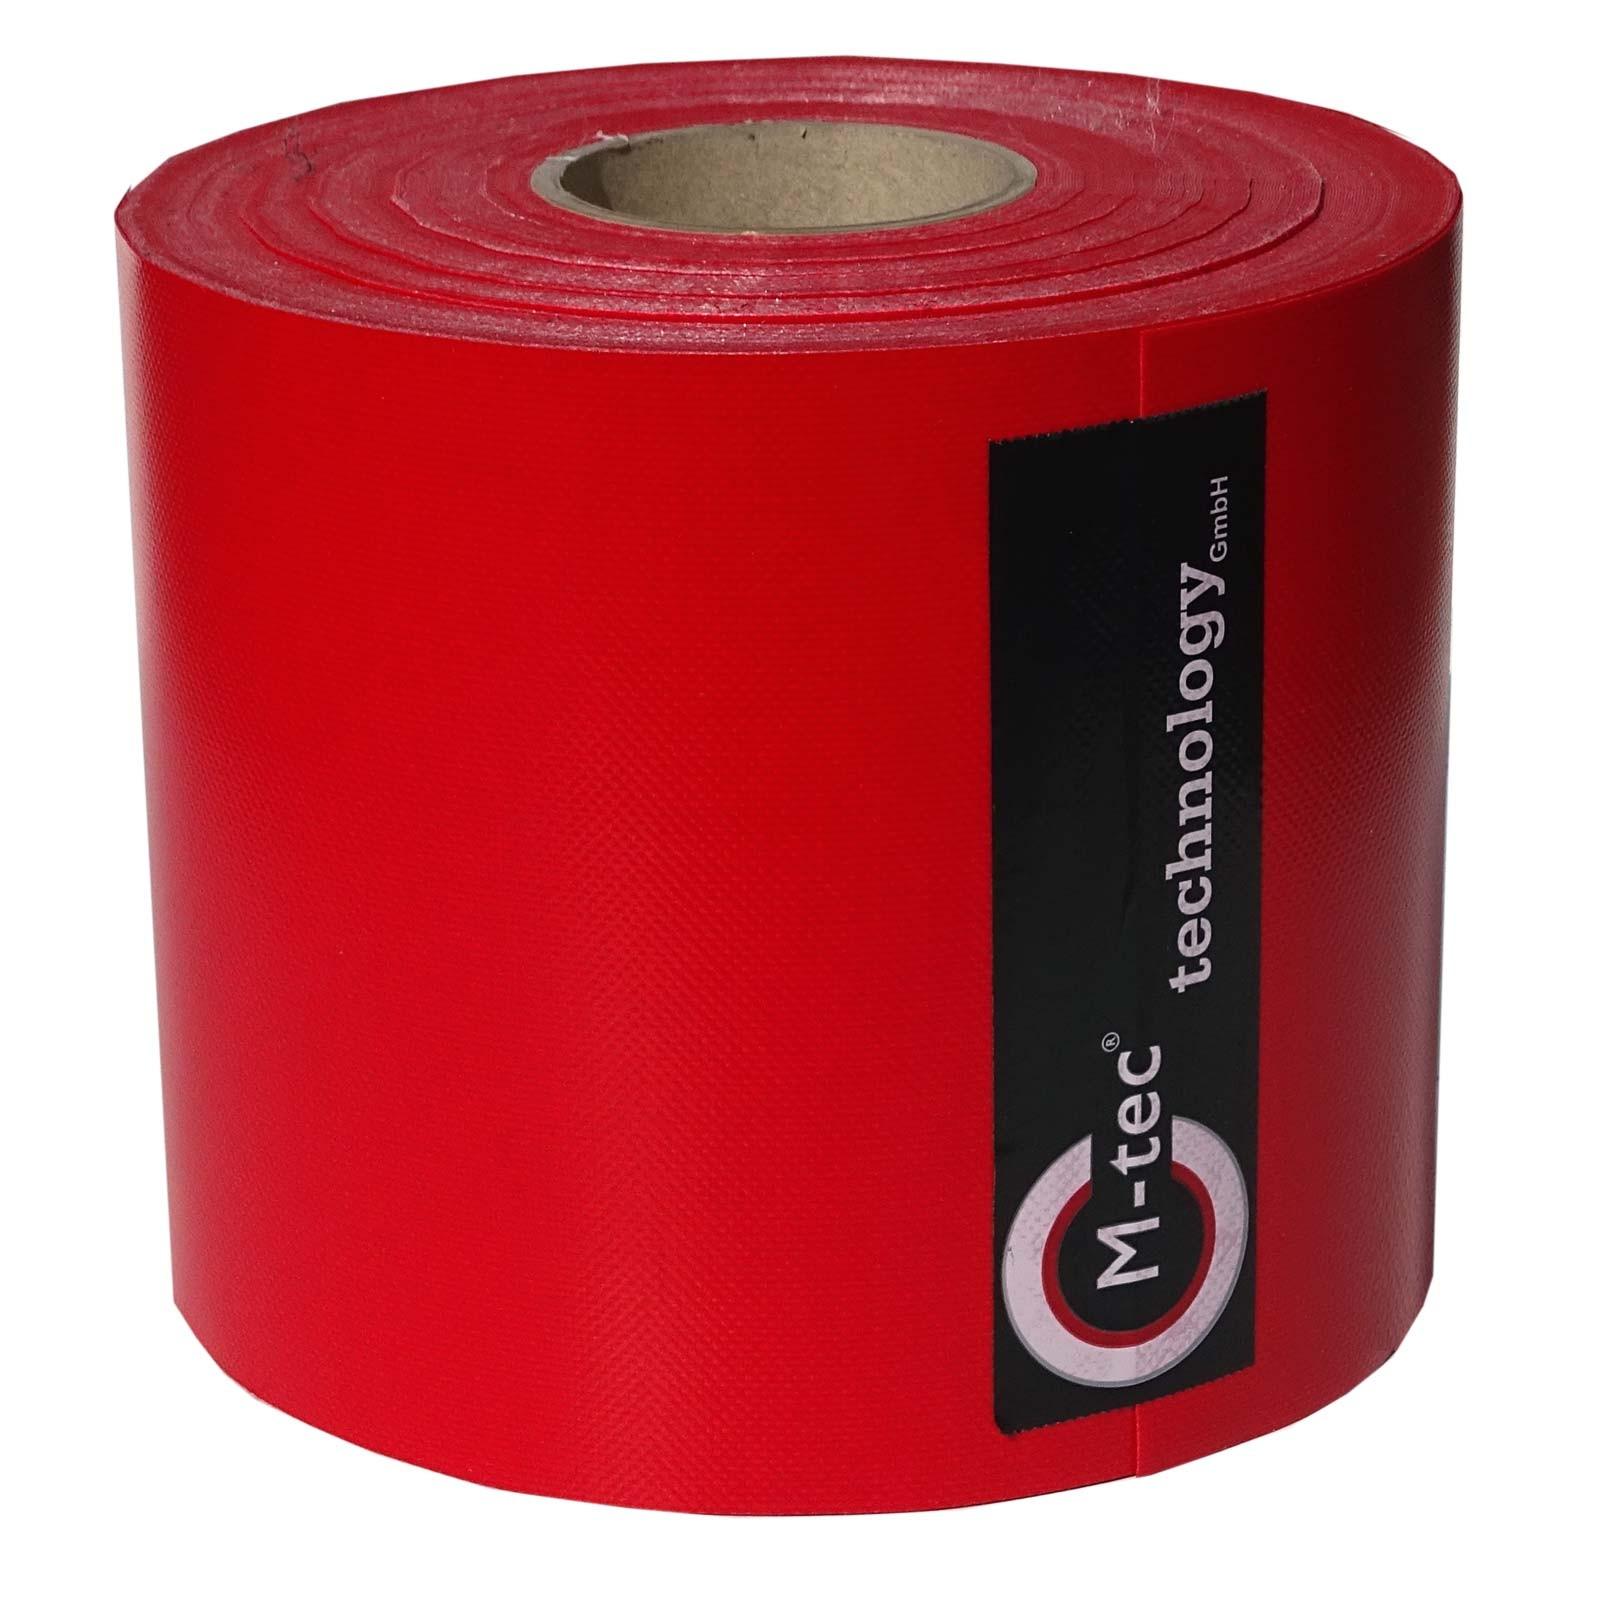 M-tec Profi-line ® - Weich PVC rot